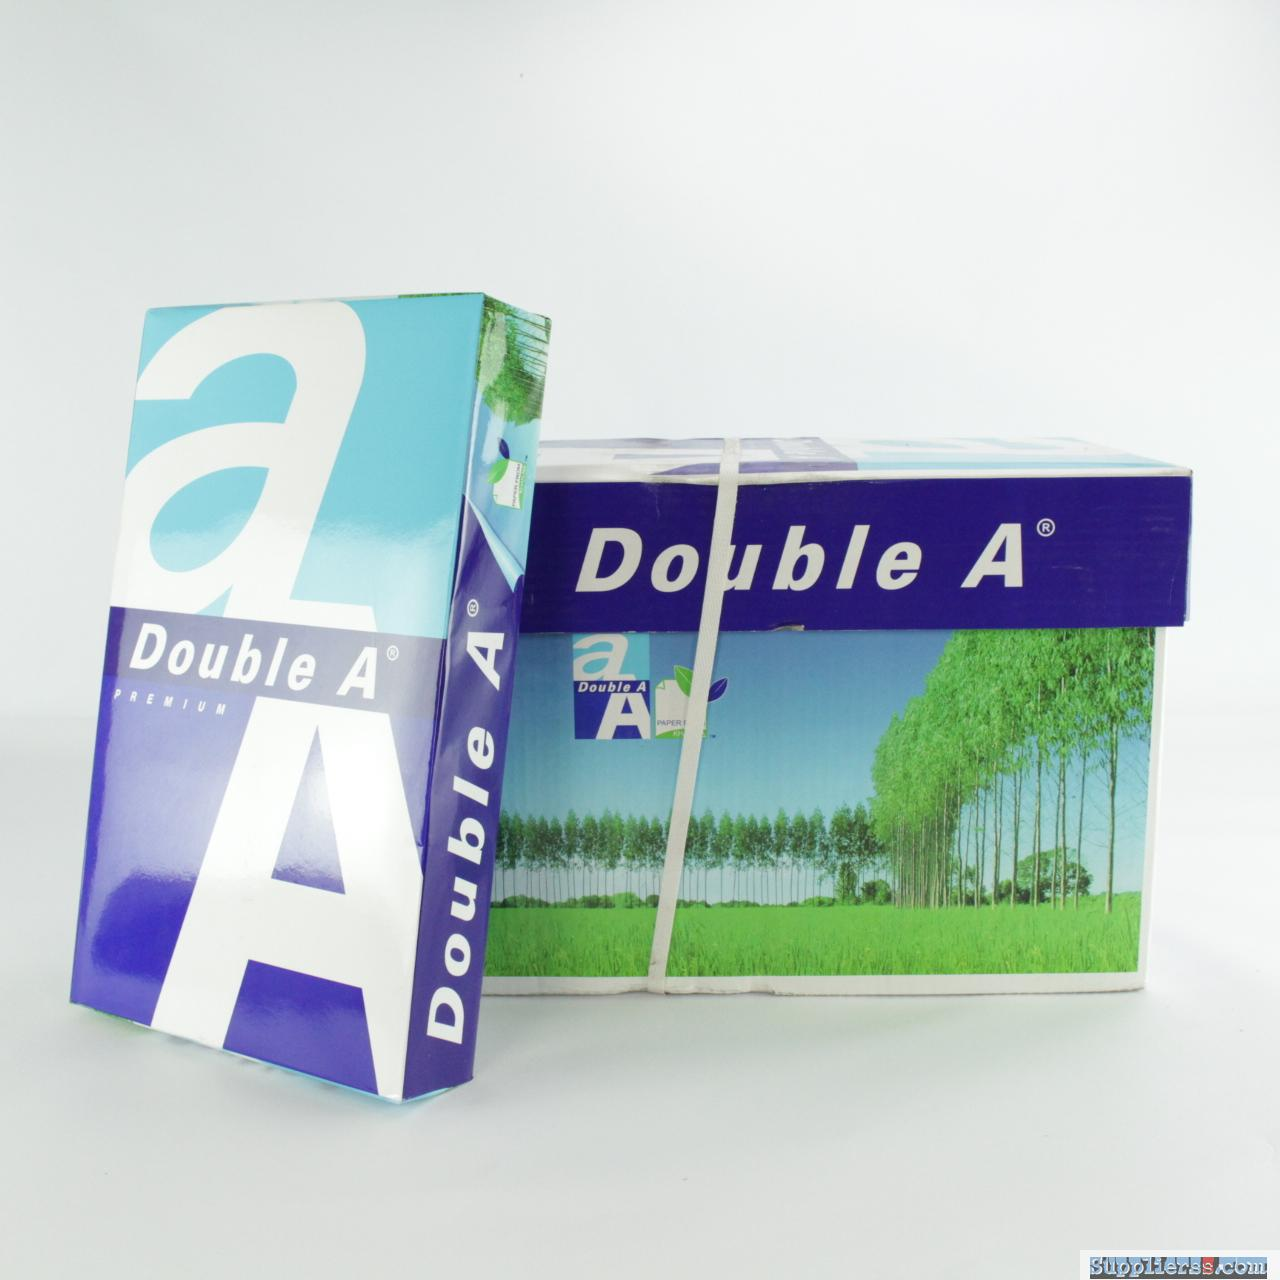 Double A A4 Copy Paper Thailand 70 GSM 80gsm Manufacturer Exporter